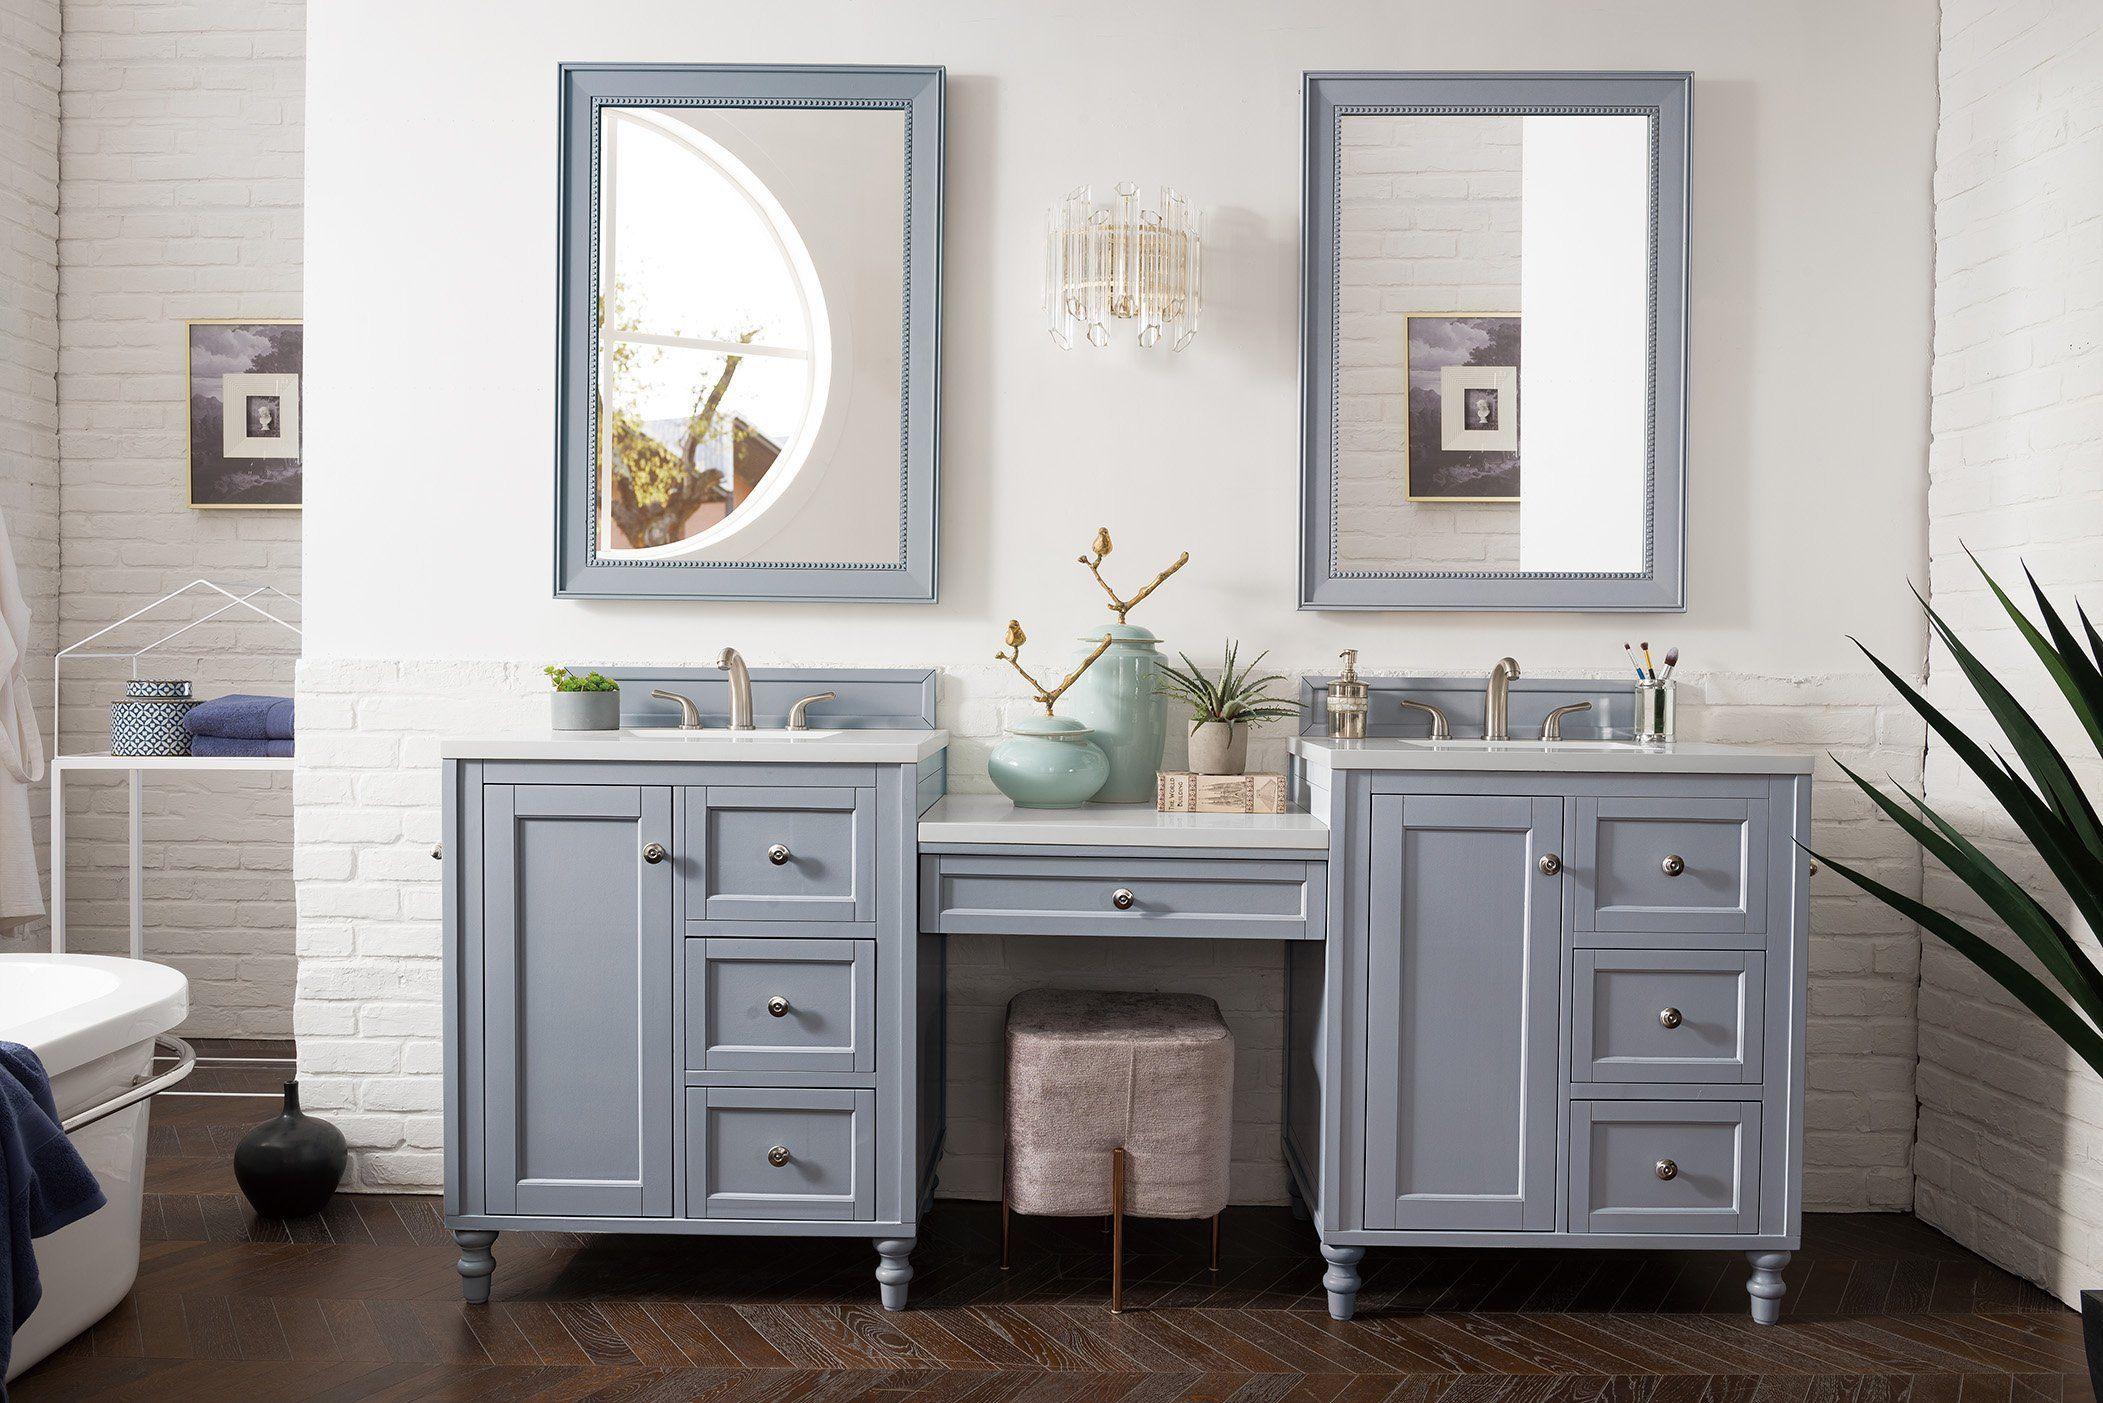 Copper Cove Encore 86 Double Bathroom Vanity Double Sink Bathroom Vanity Double Sink Bathroom Double Vanity Bathroom [ 1403 x 2103 Pixel ]